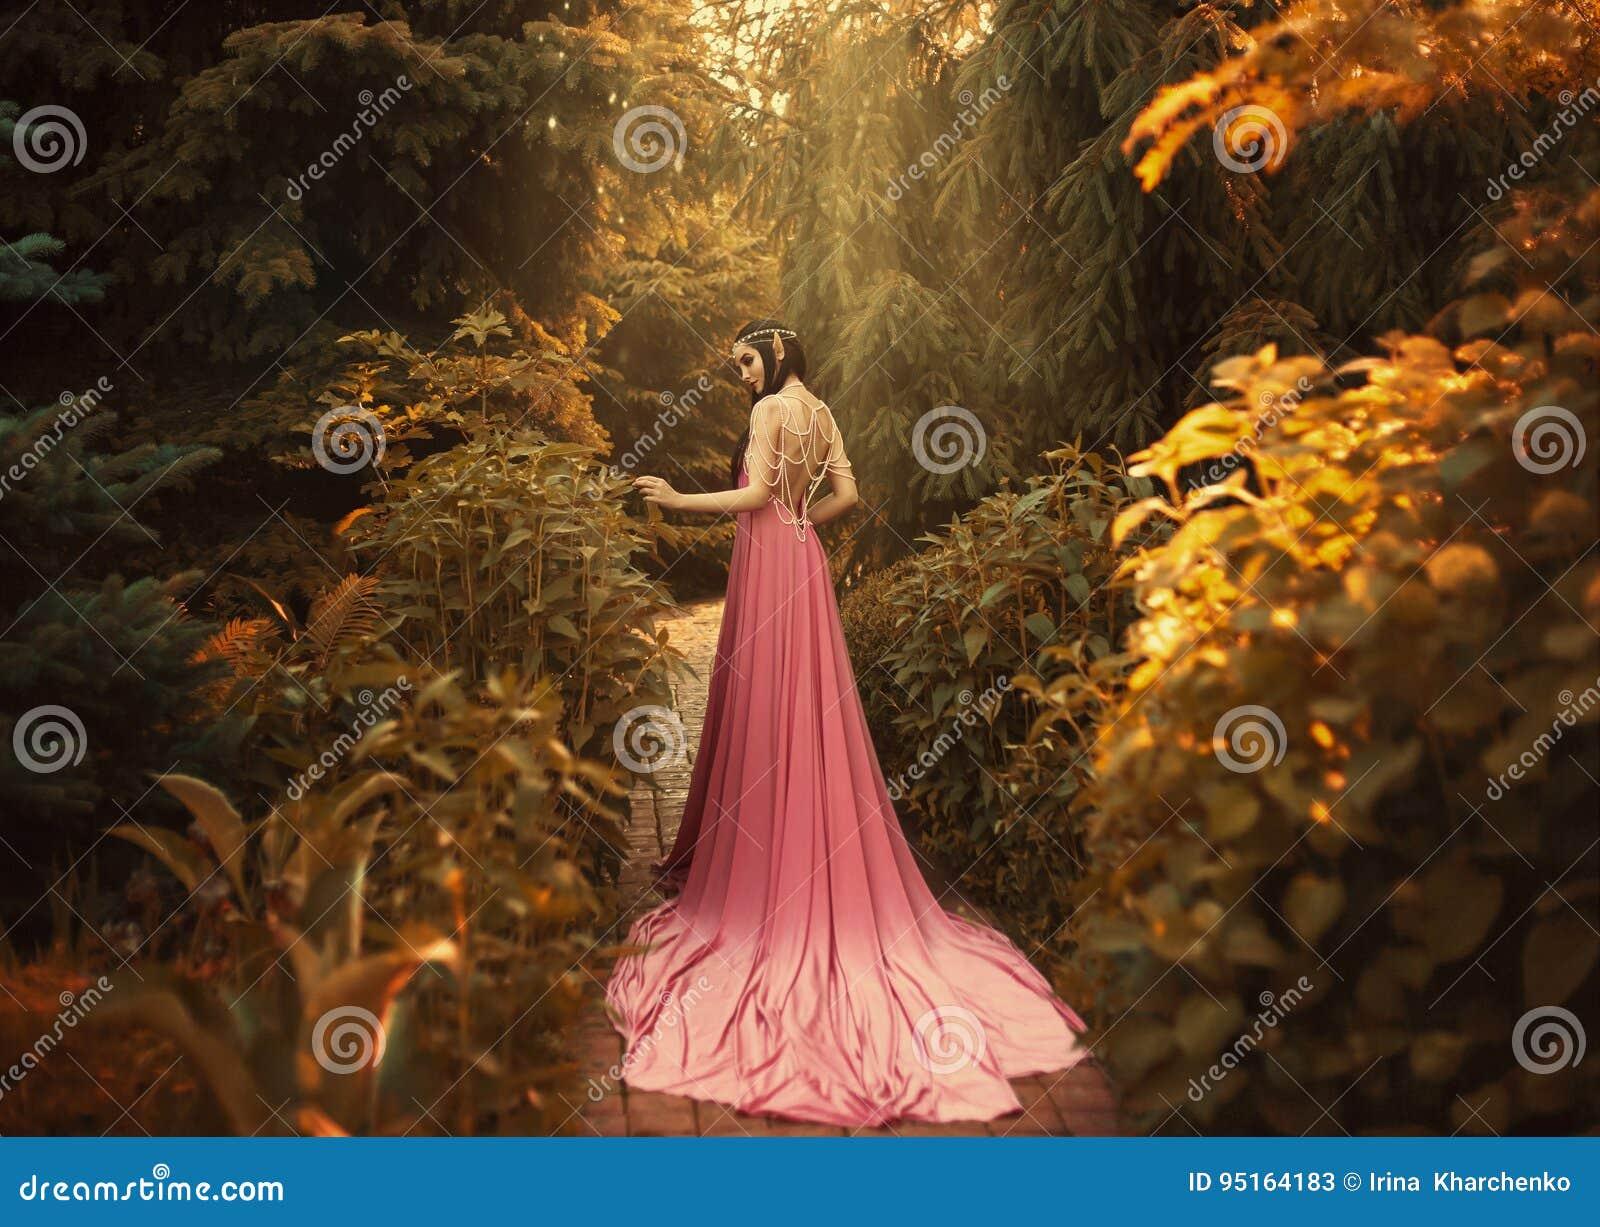 The Elf walks in the autumn garden